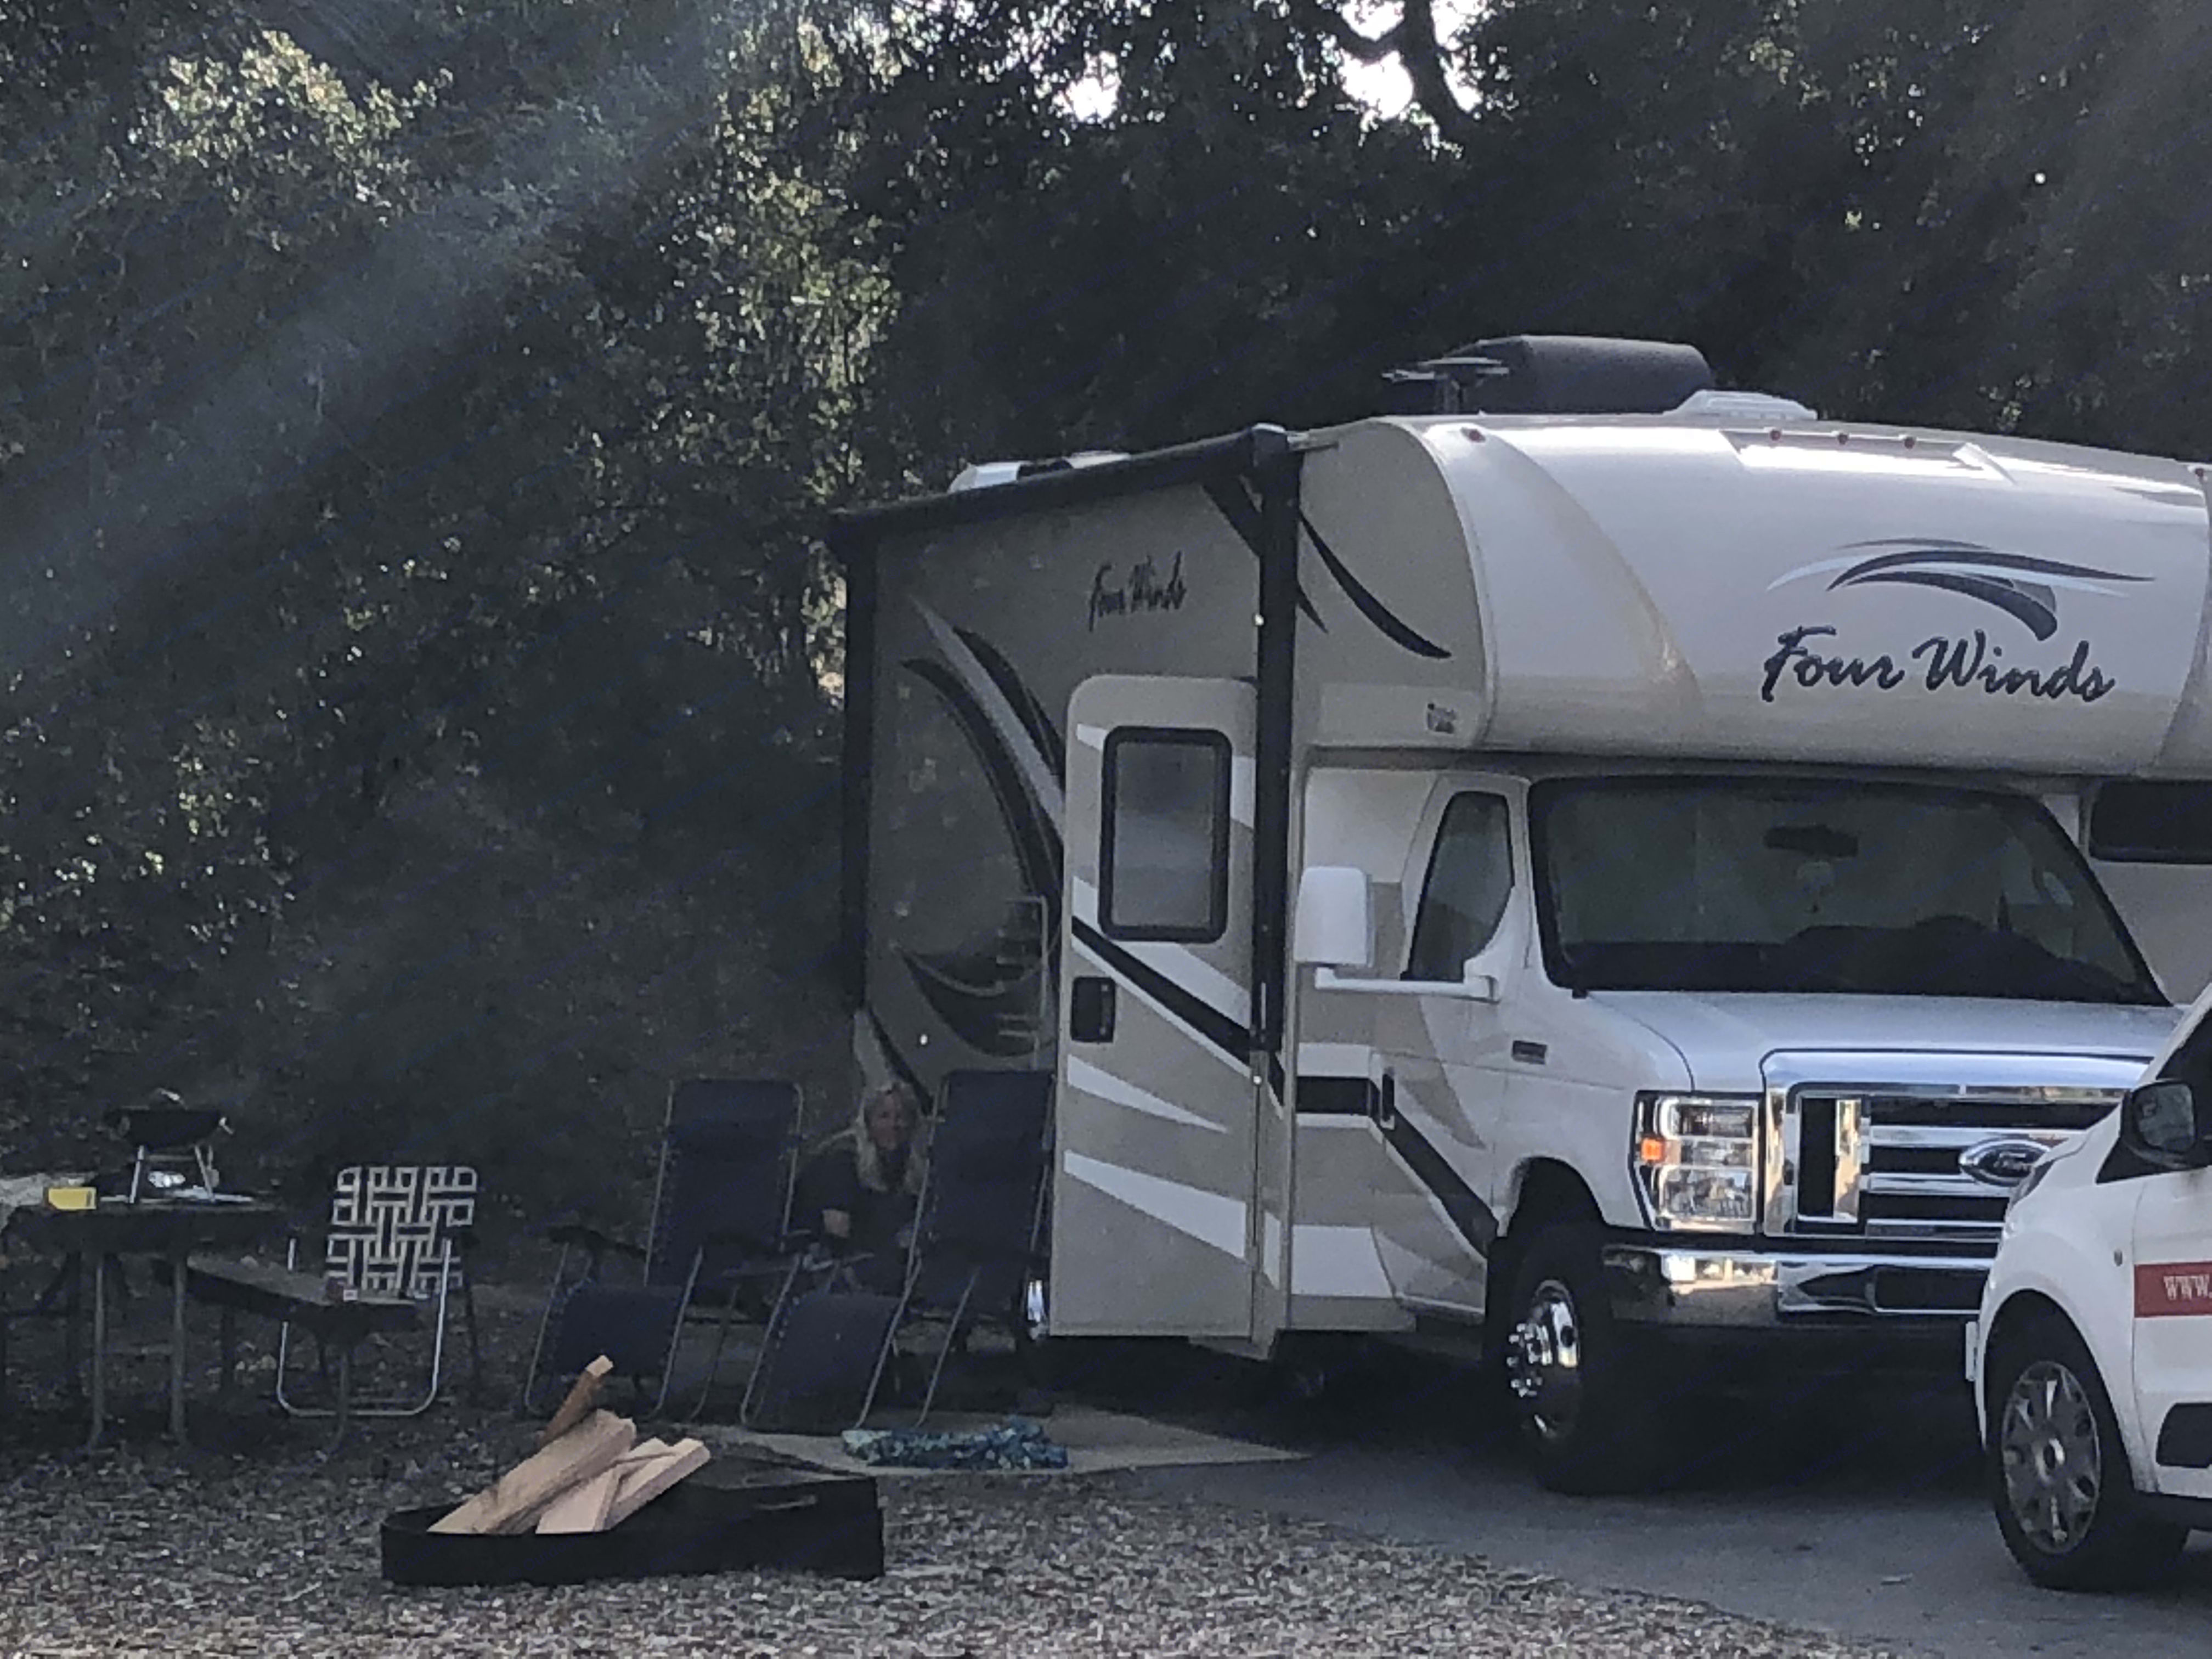 Camping at oak park April 10-14 2018. Thor Four winds 2018